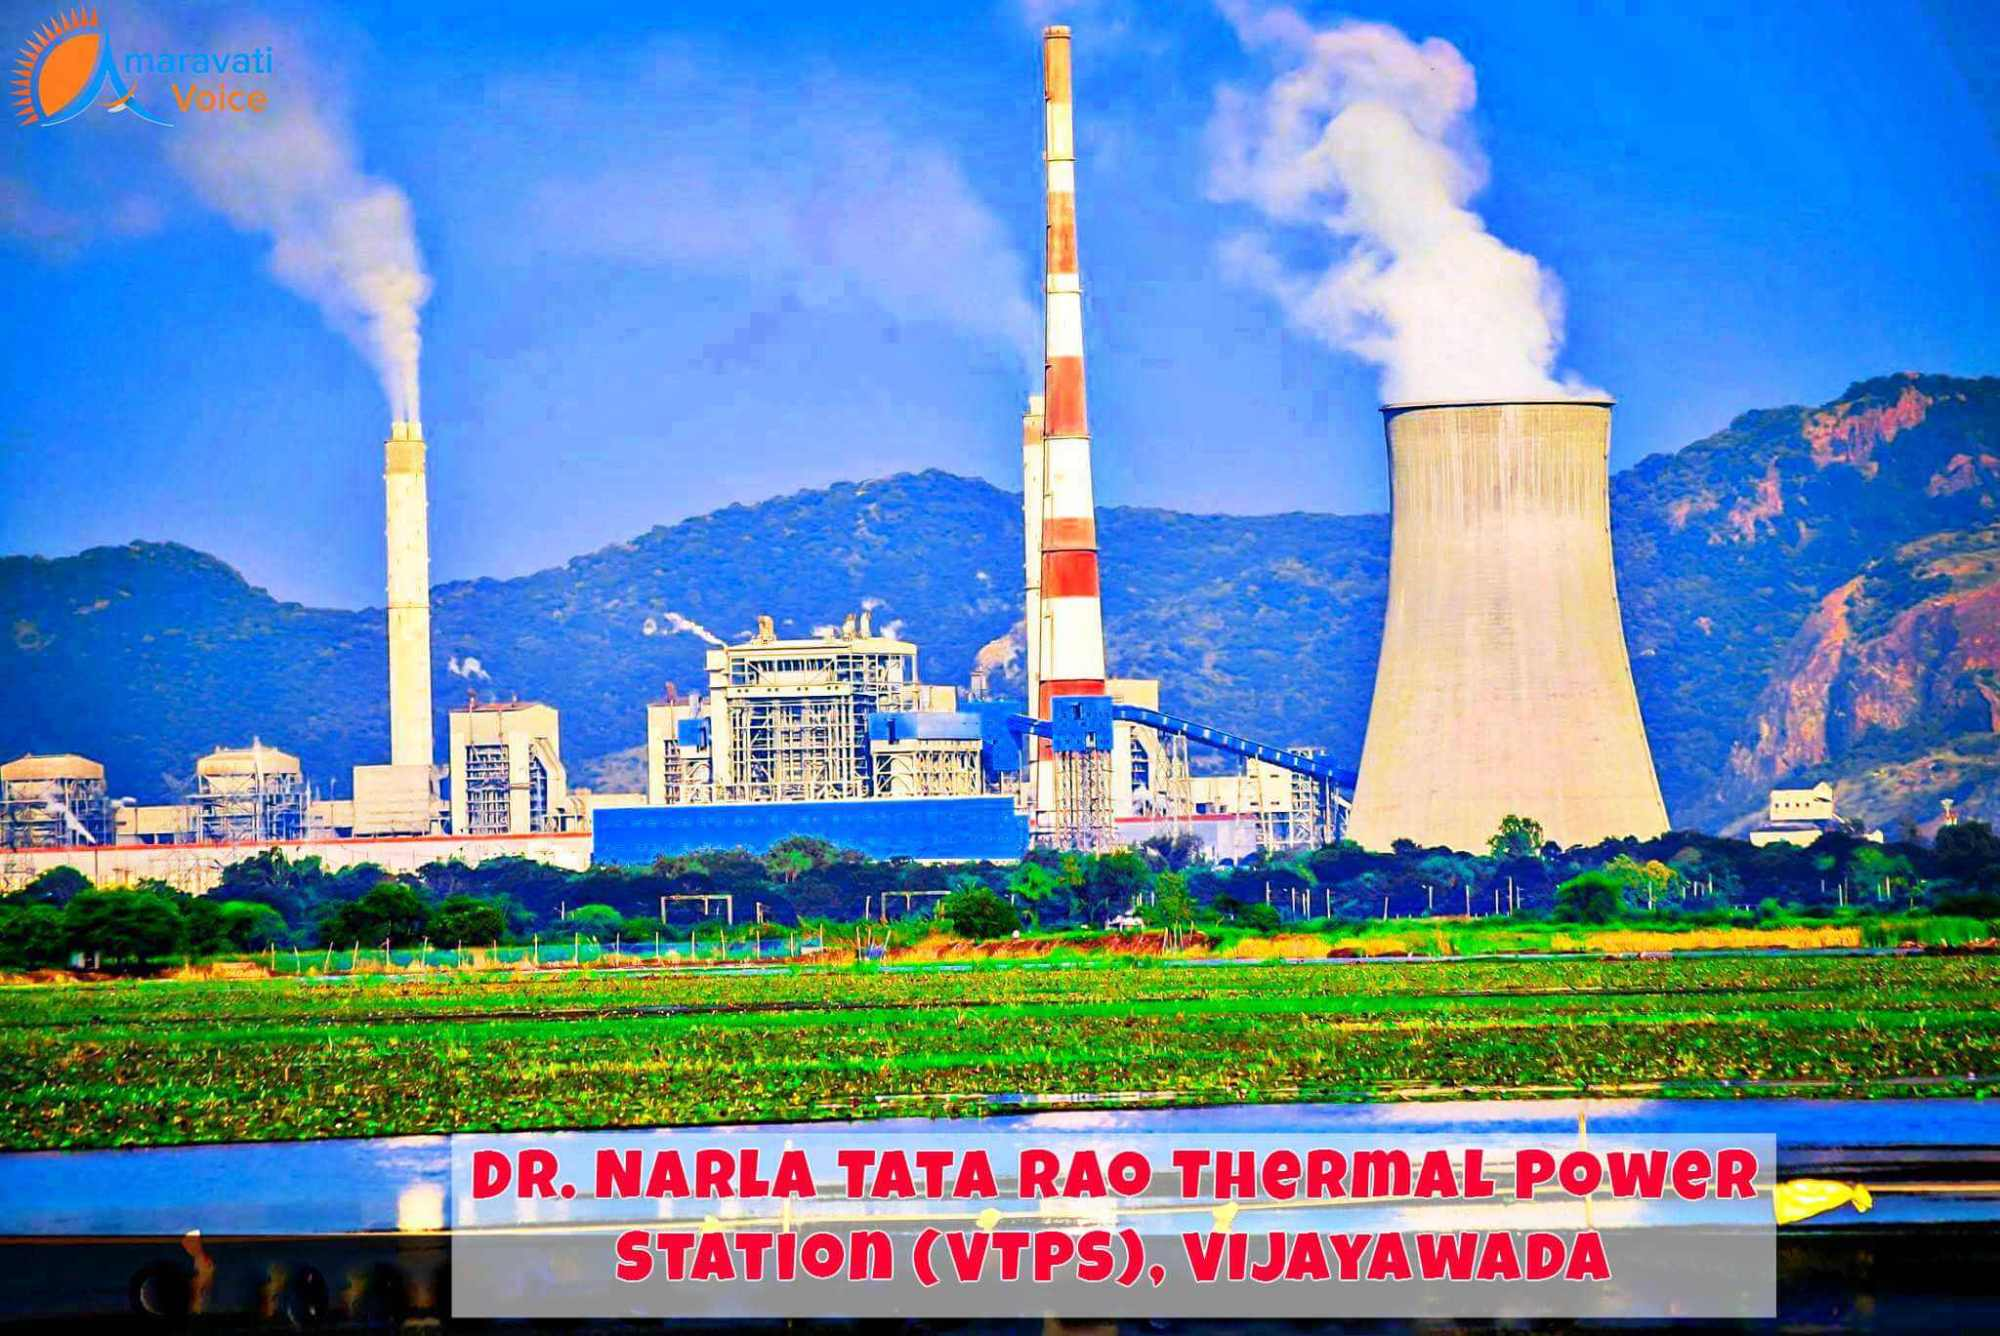 hight resolution of dr narla tata rao thermal power station vtps last updated 27 november 2015